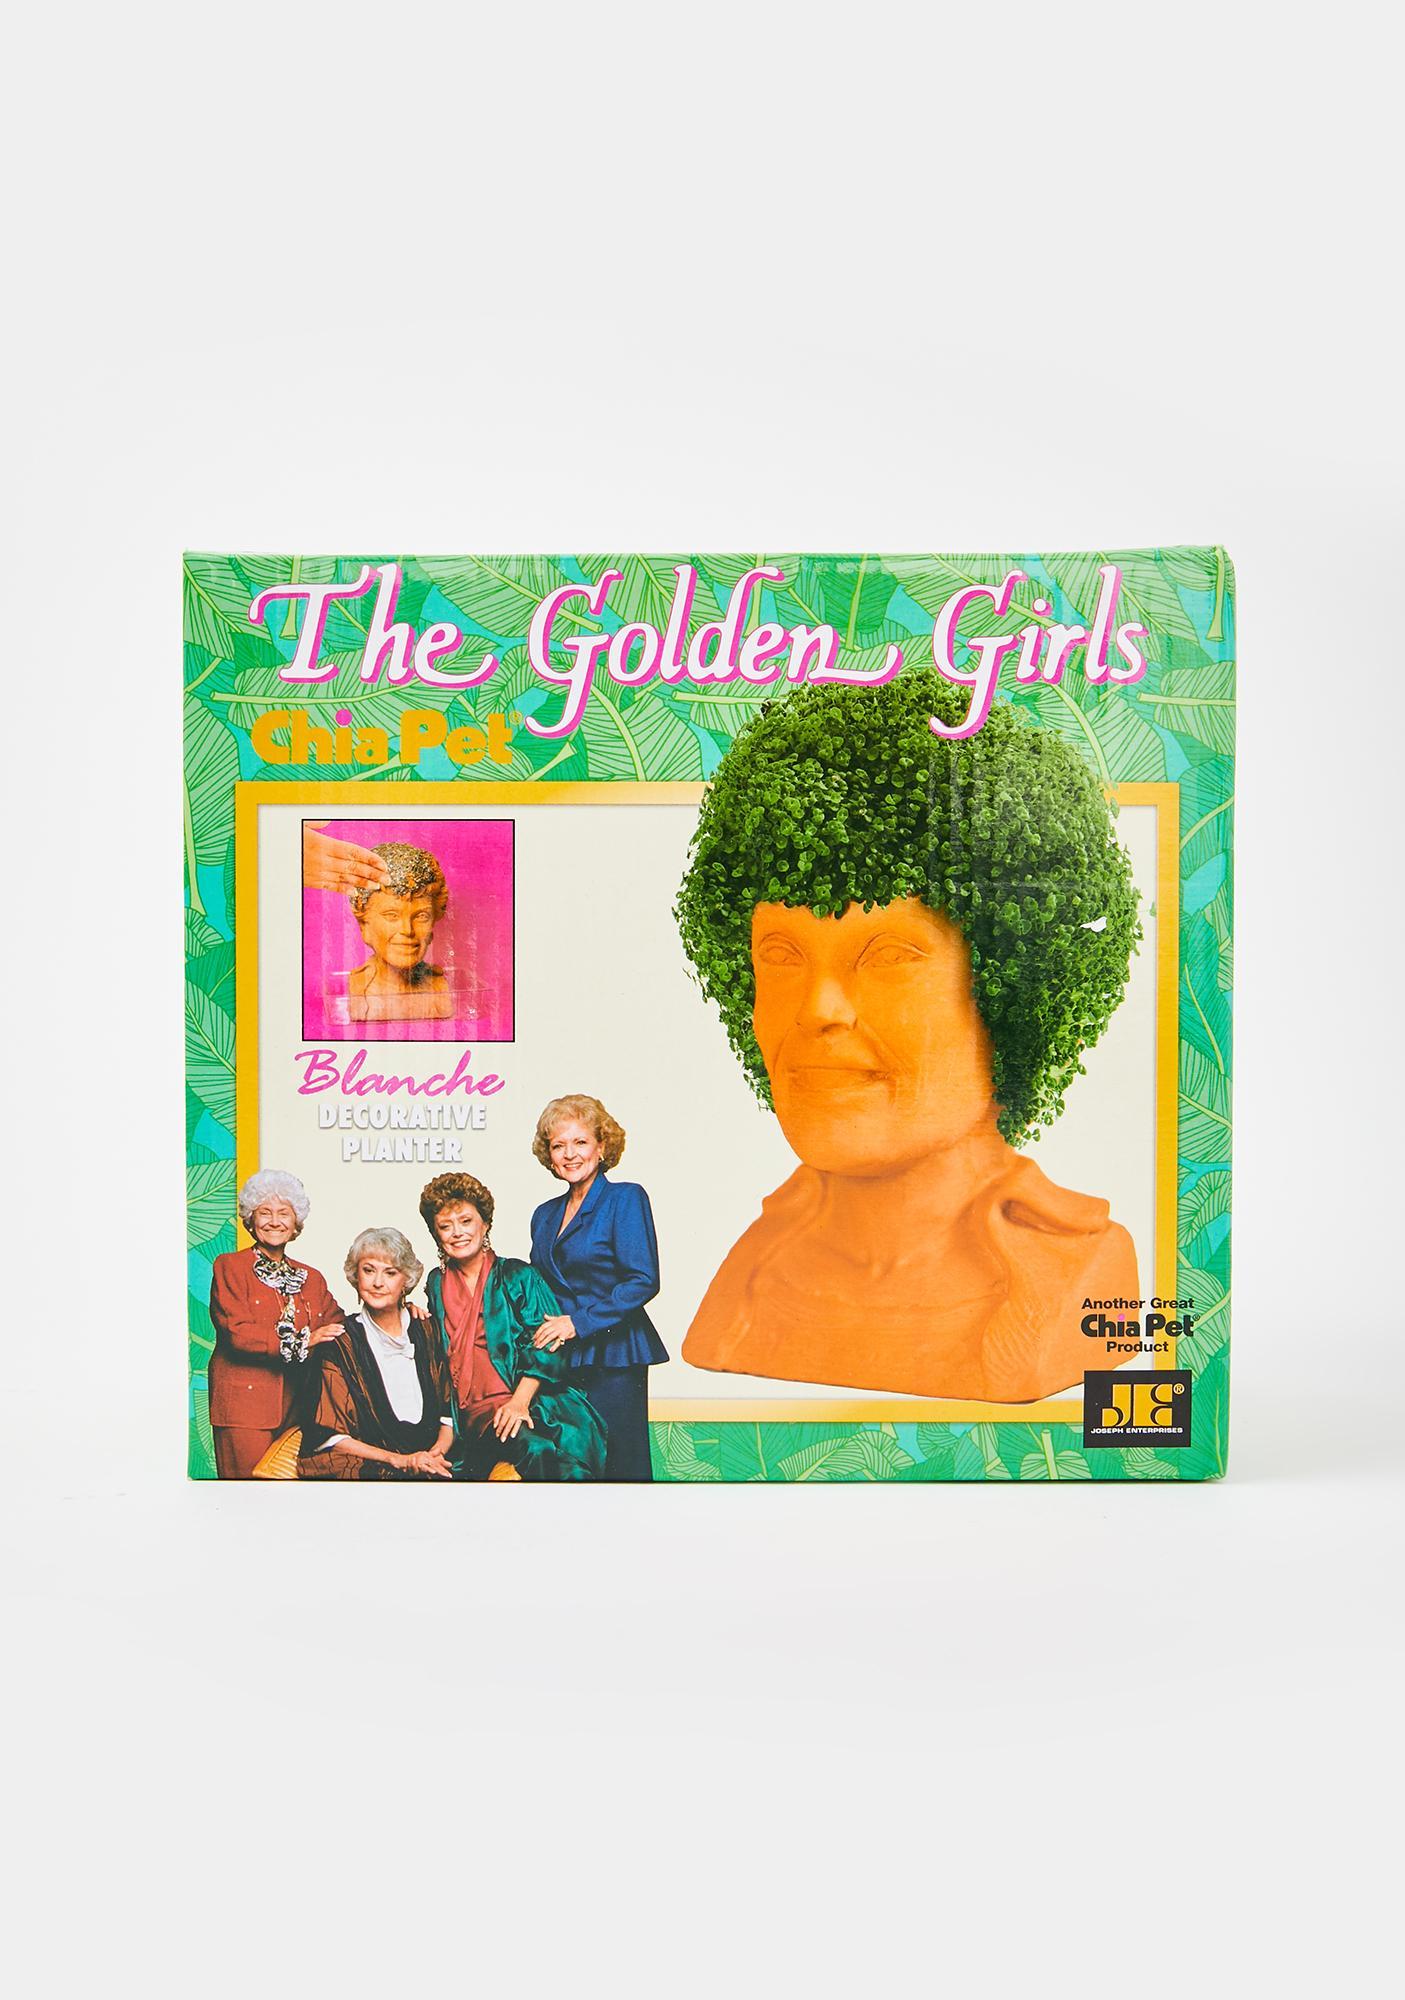 Chia Pet Golden Girls Blanche Planter